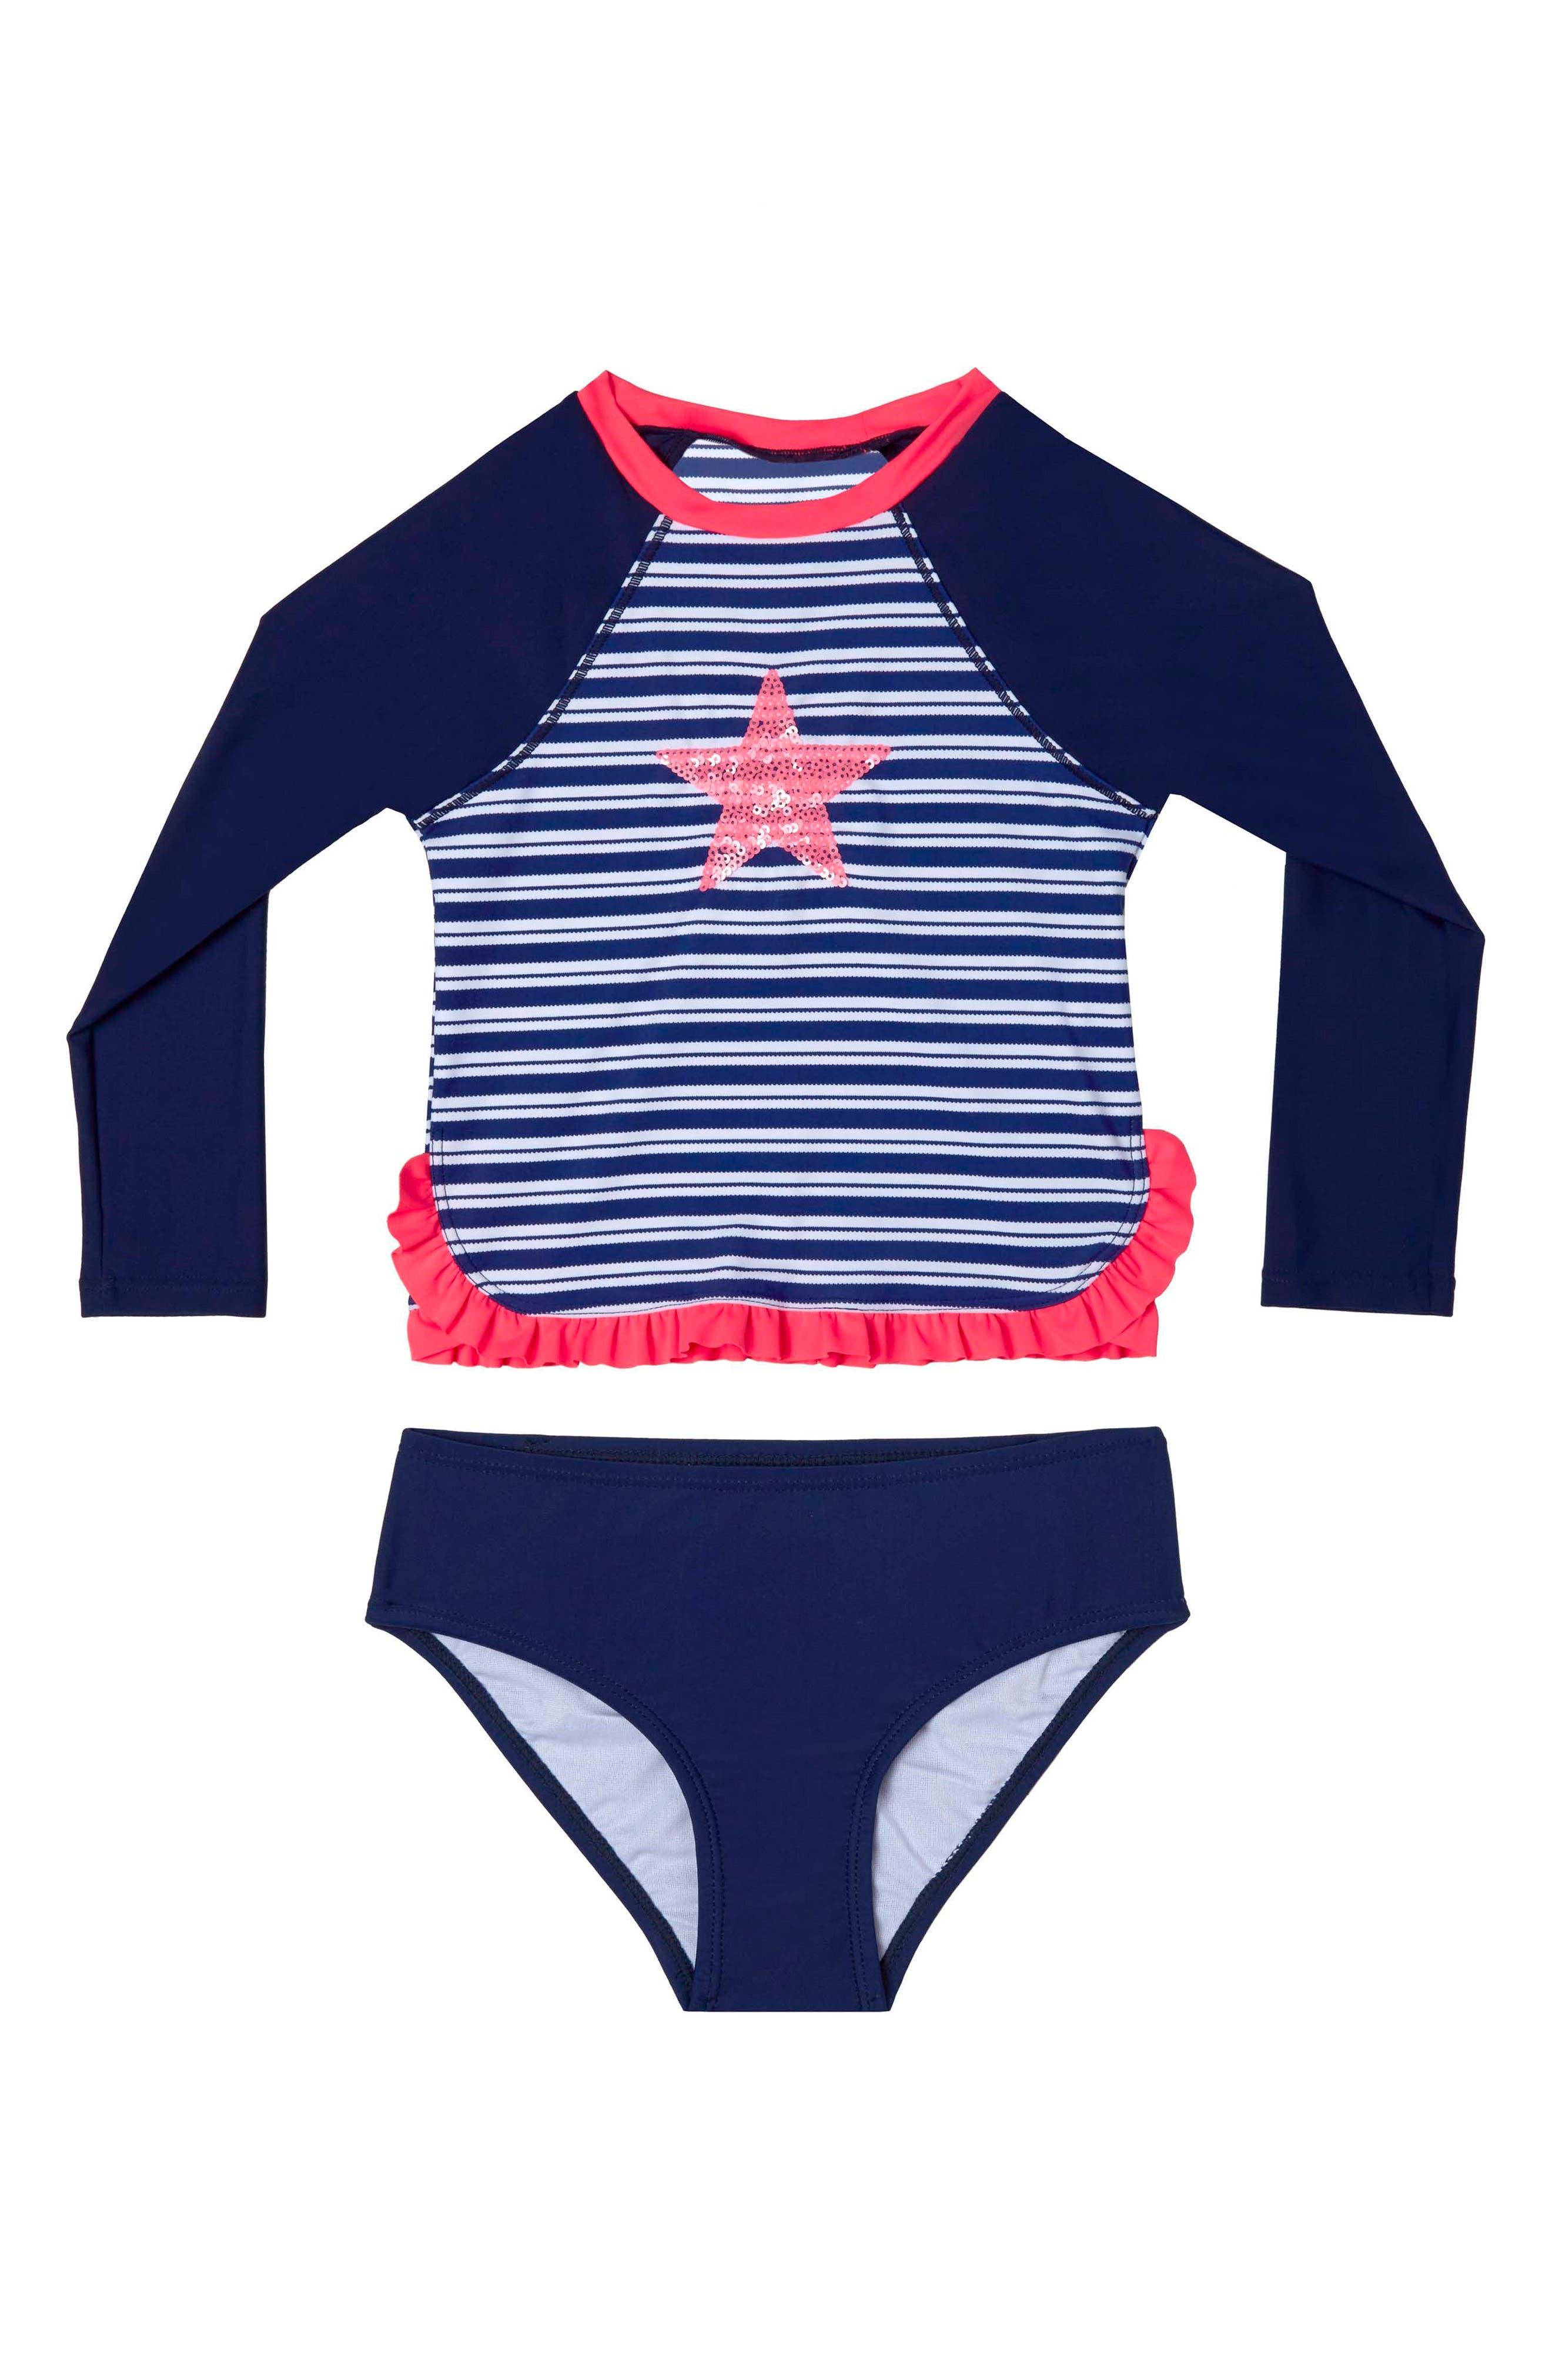 Retro Stripe Two-Piece Rashguard Swimsuit,                         Main,                         color, Navy